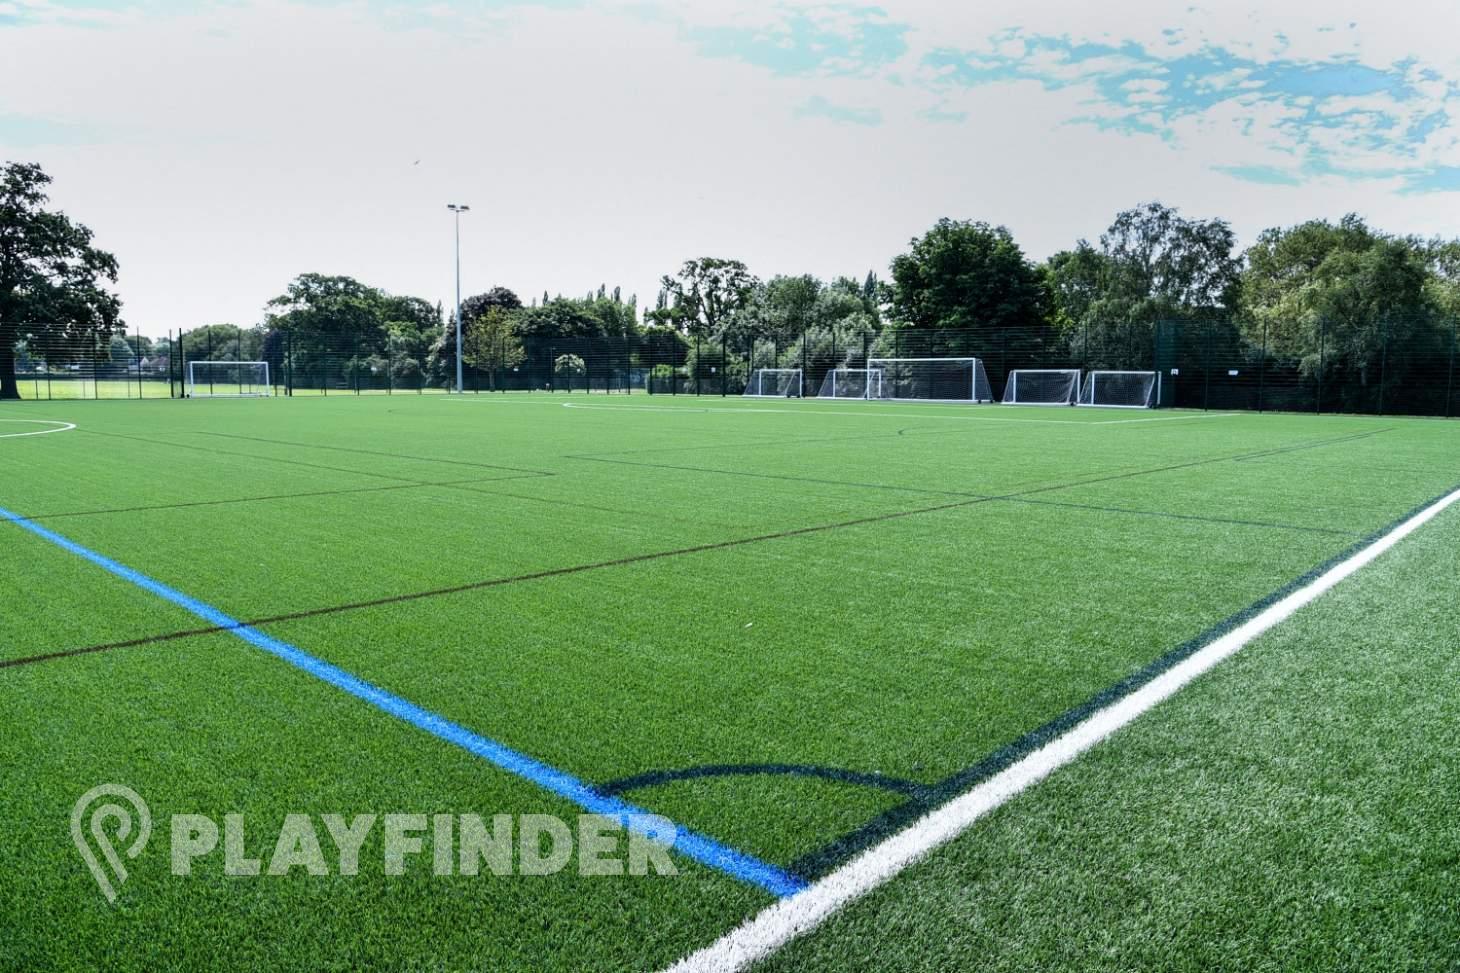 Barnet Lane 3G Pitch 9 a side | 3G Astroturf football pitch